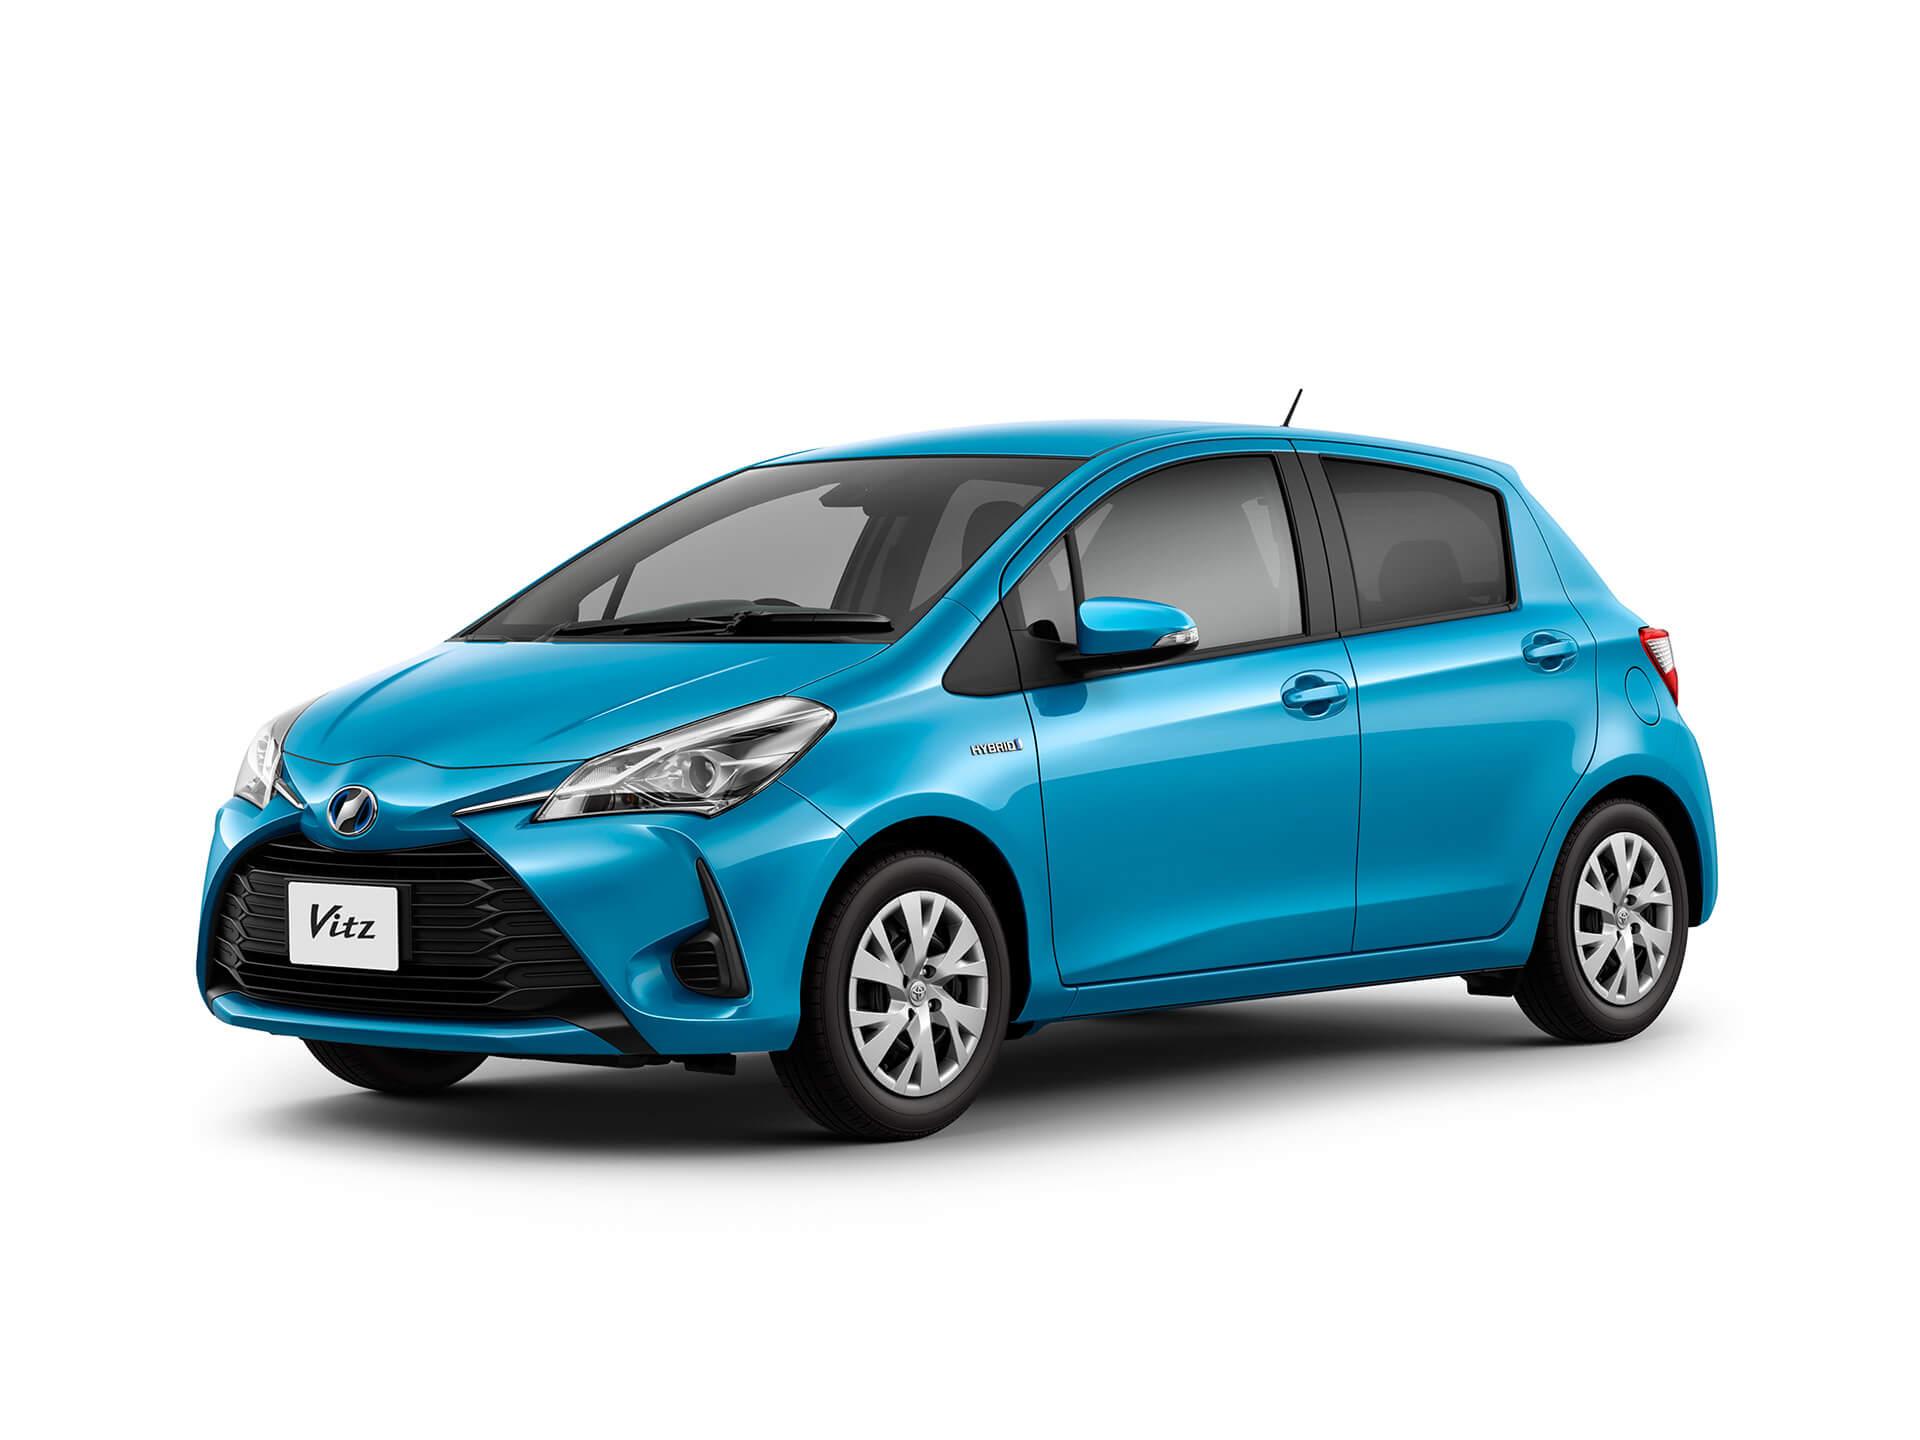 Toyota_Vitz_DAA-NHP130_front_side